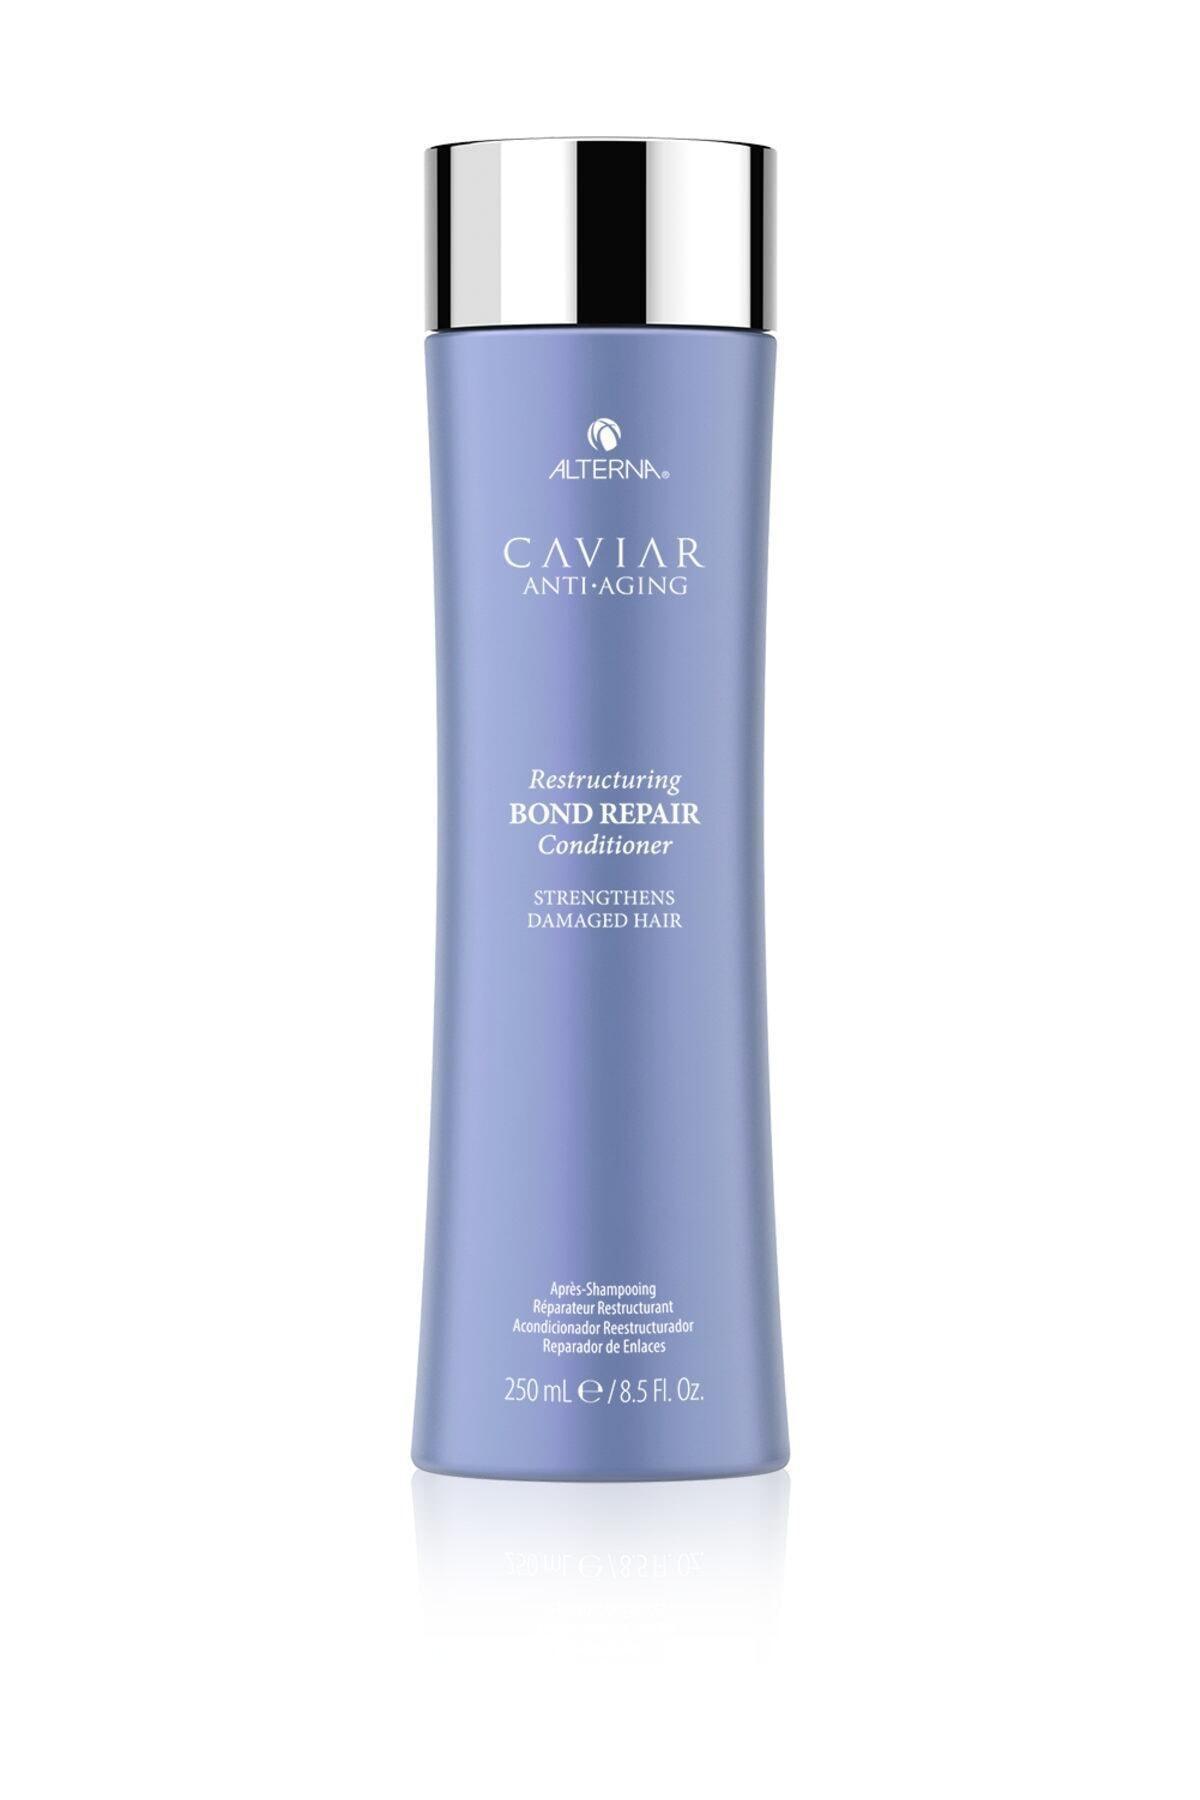 ALTERNA Caviar-acondicionador de unión, 250 ml